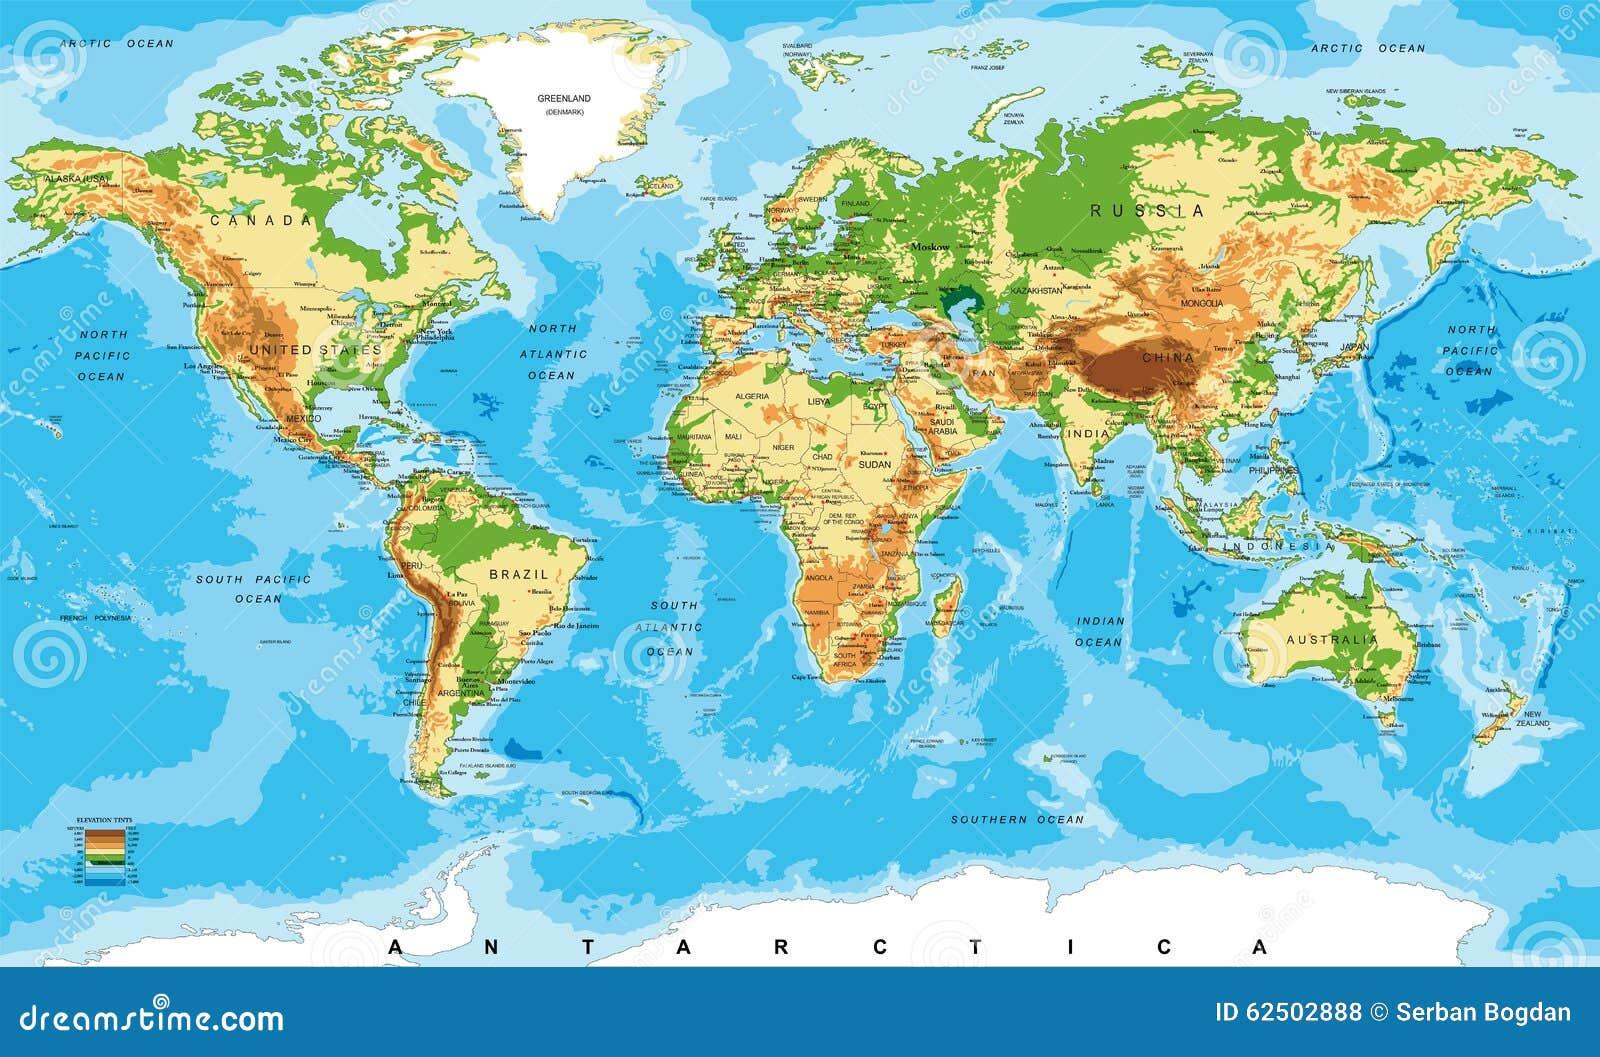 Mapa Físico Del Mundo.Mapa Fisico Do Mundo Ilustracao Do Vetor Ilustracao De Arte